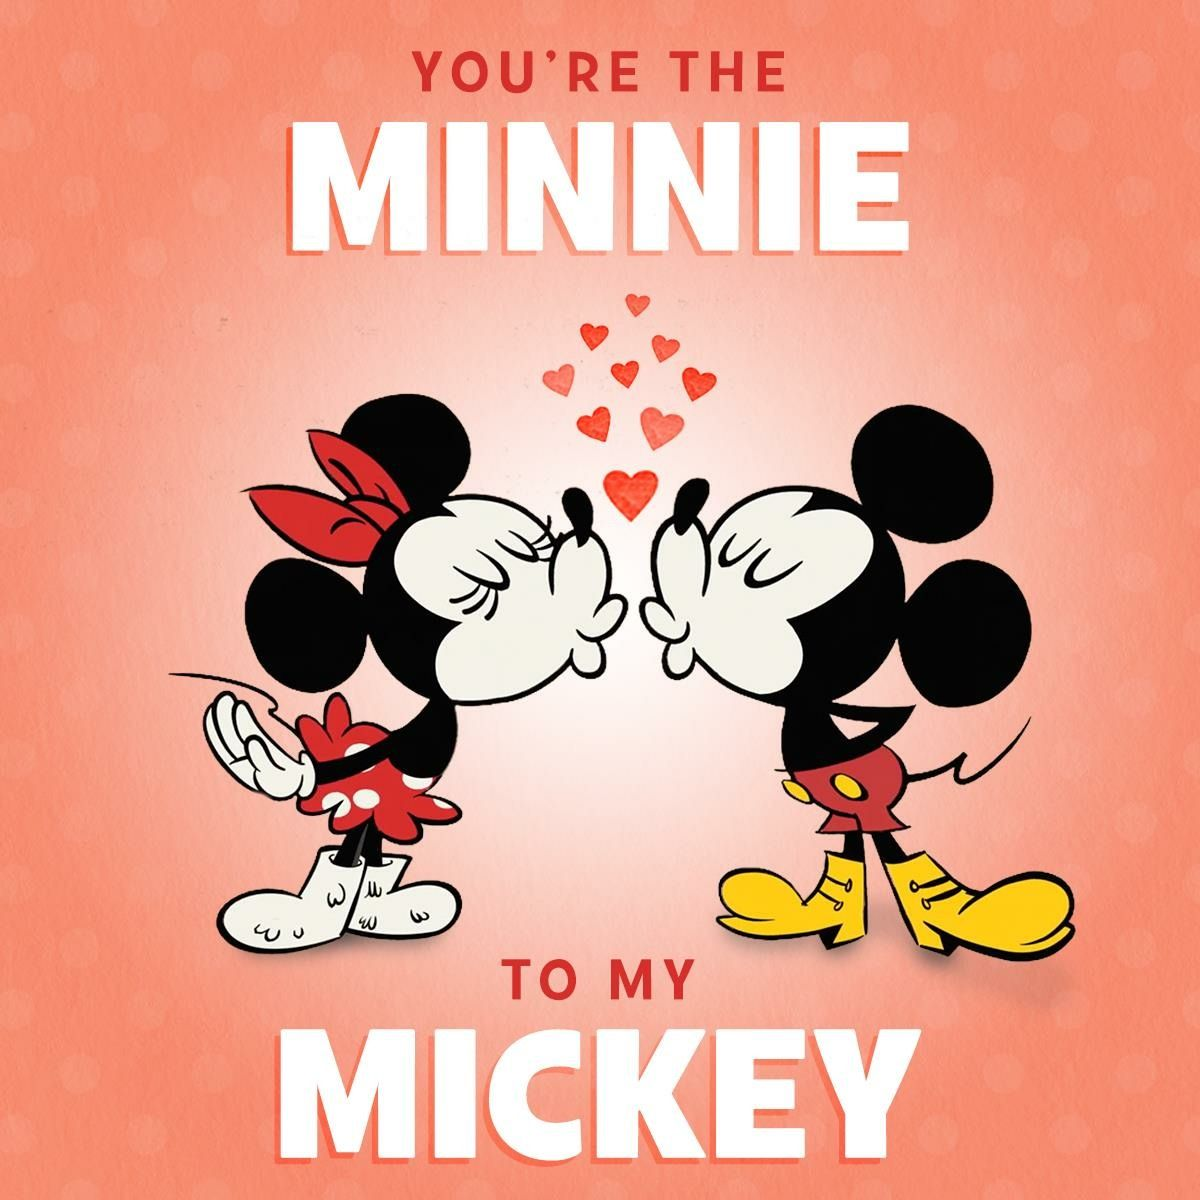 Ratones enamorados disney pinterest mice mickey mouse and ratones enamorados mickey minnie altavistaventures Choice Image